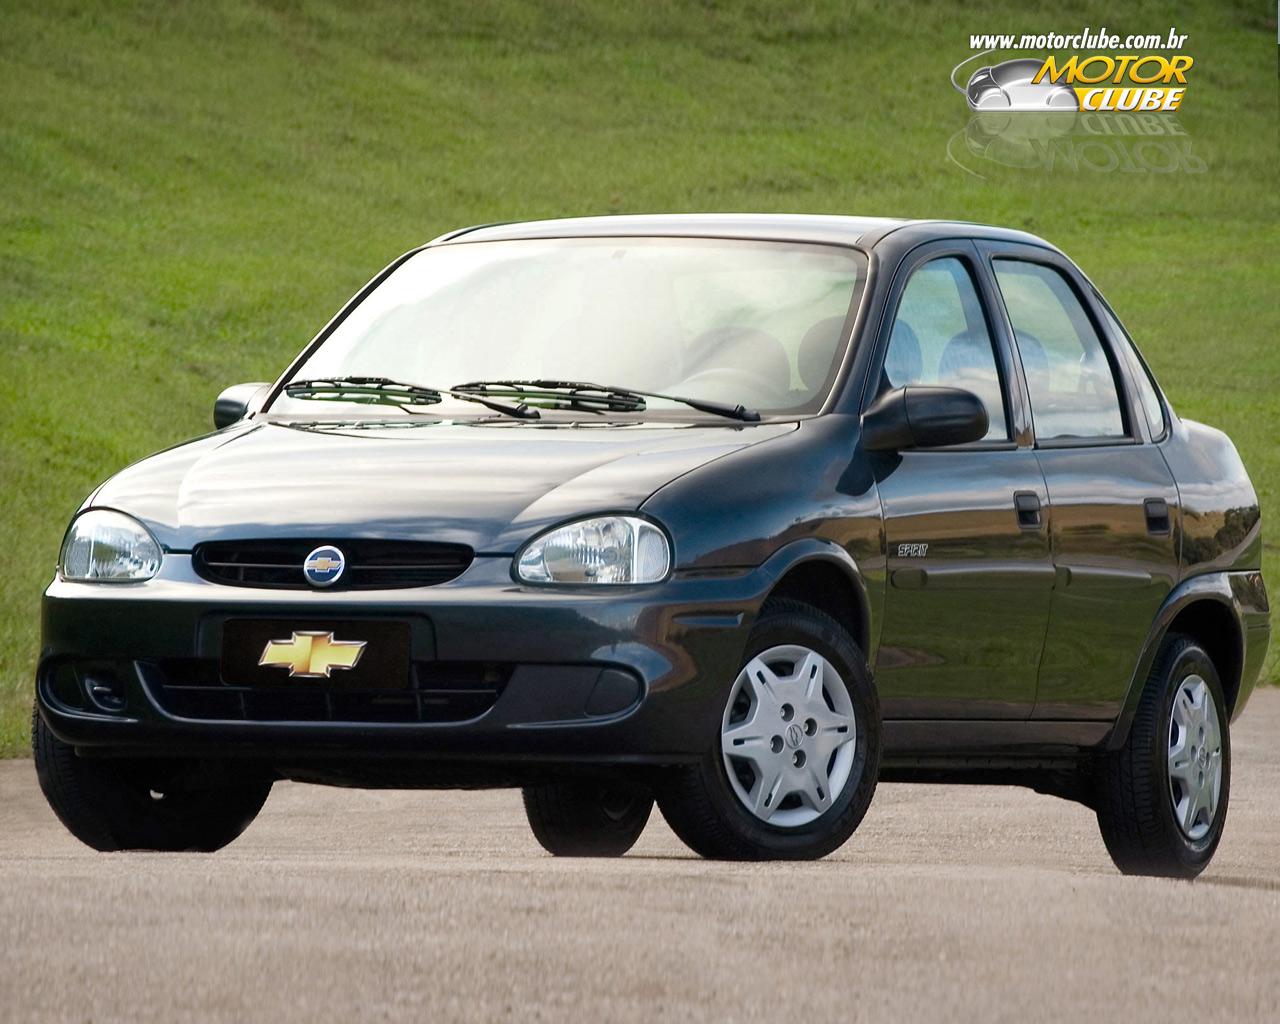 Chevrolet Corsa Classic Picture 14 Reviews News